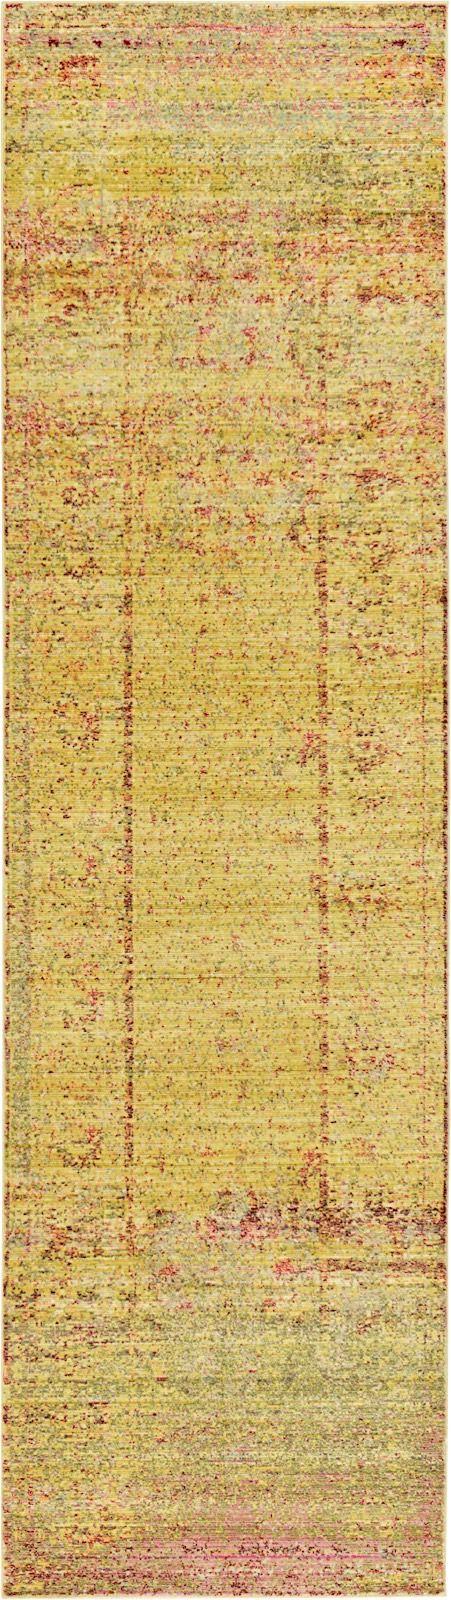 rugpal greta southwestern/lodge area rug collection